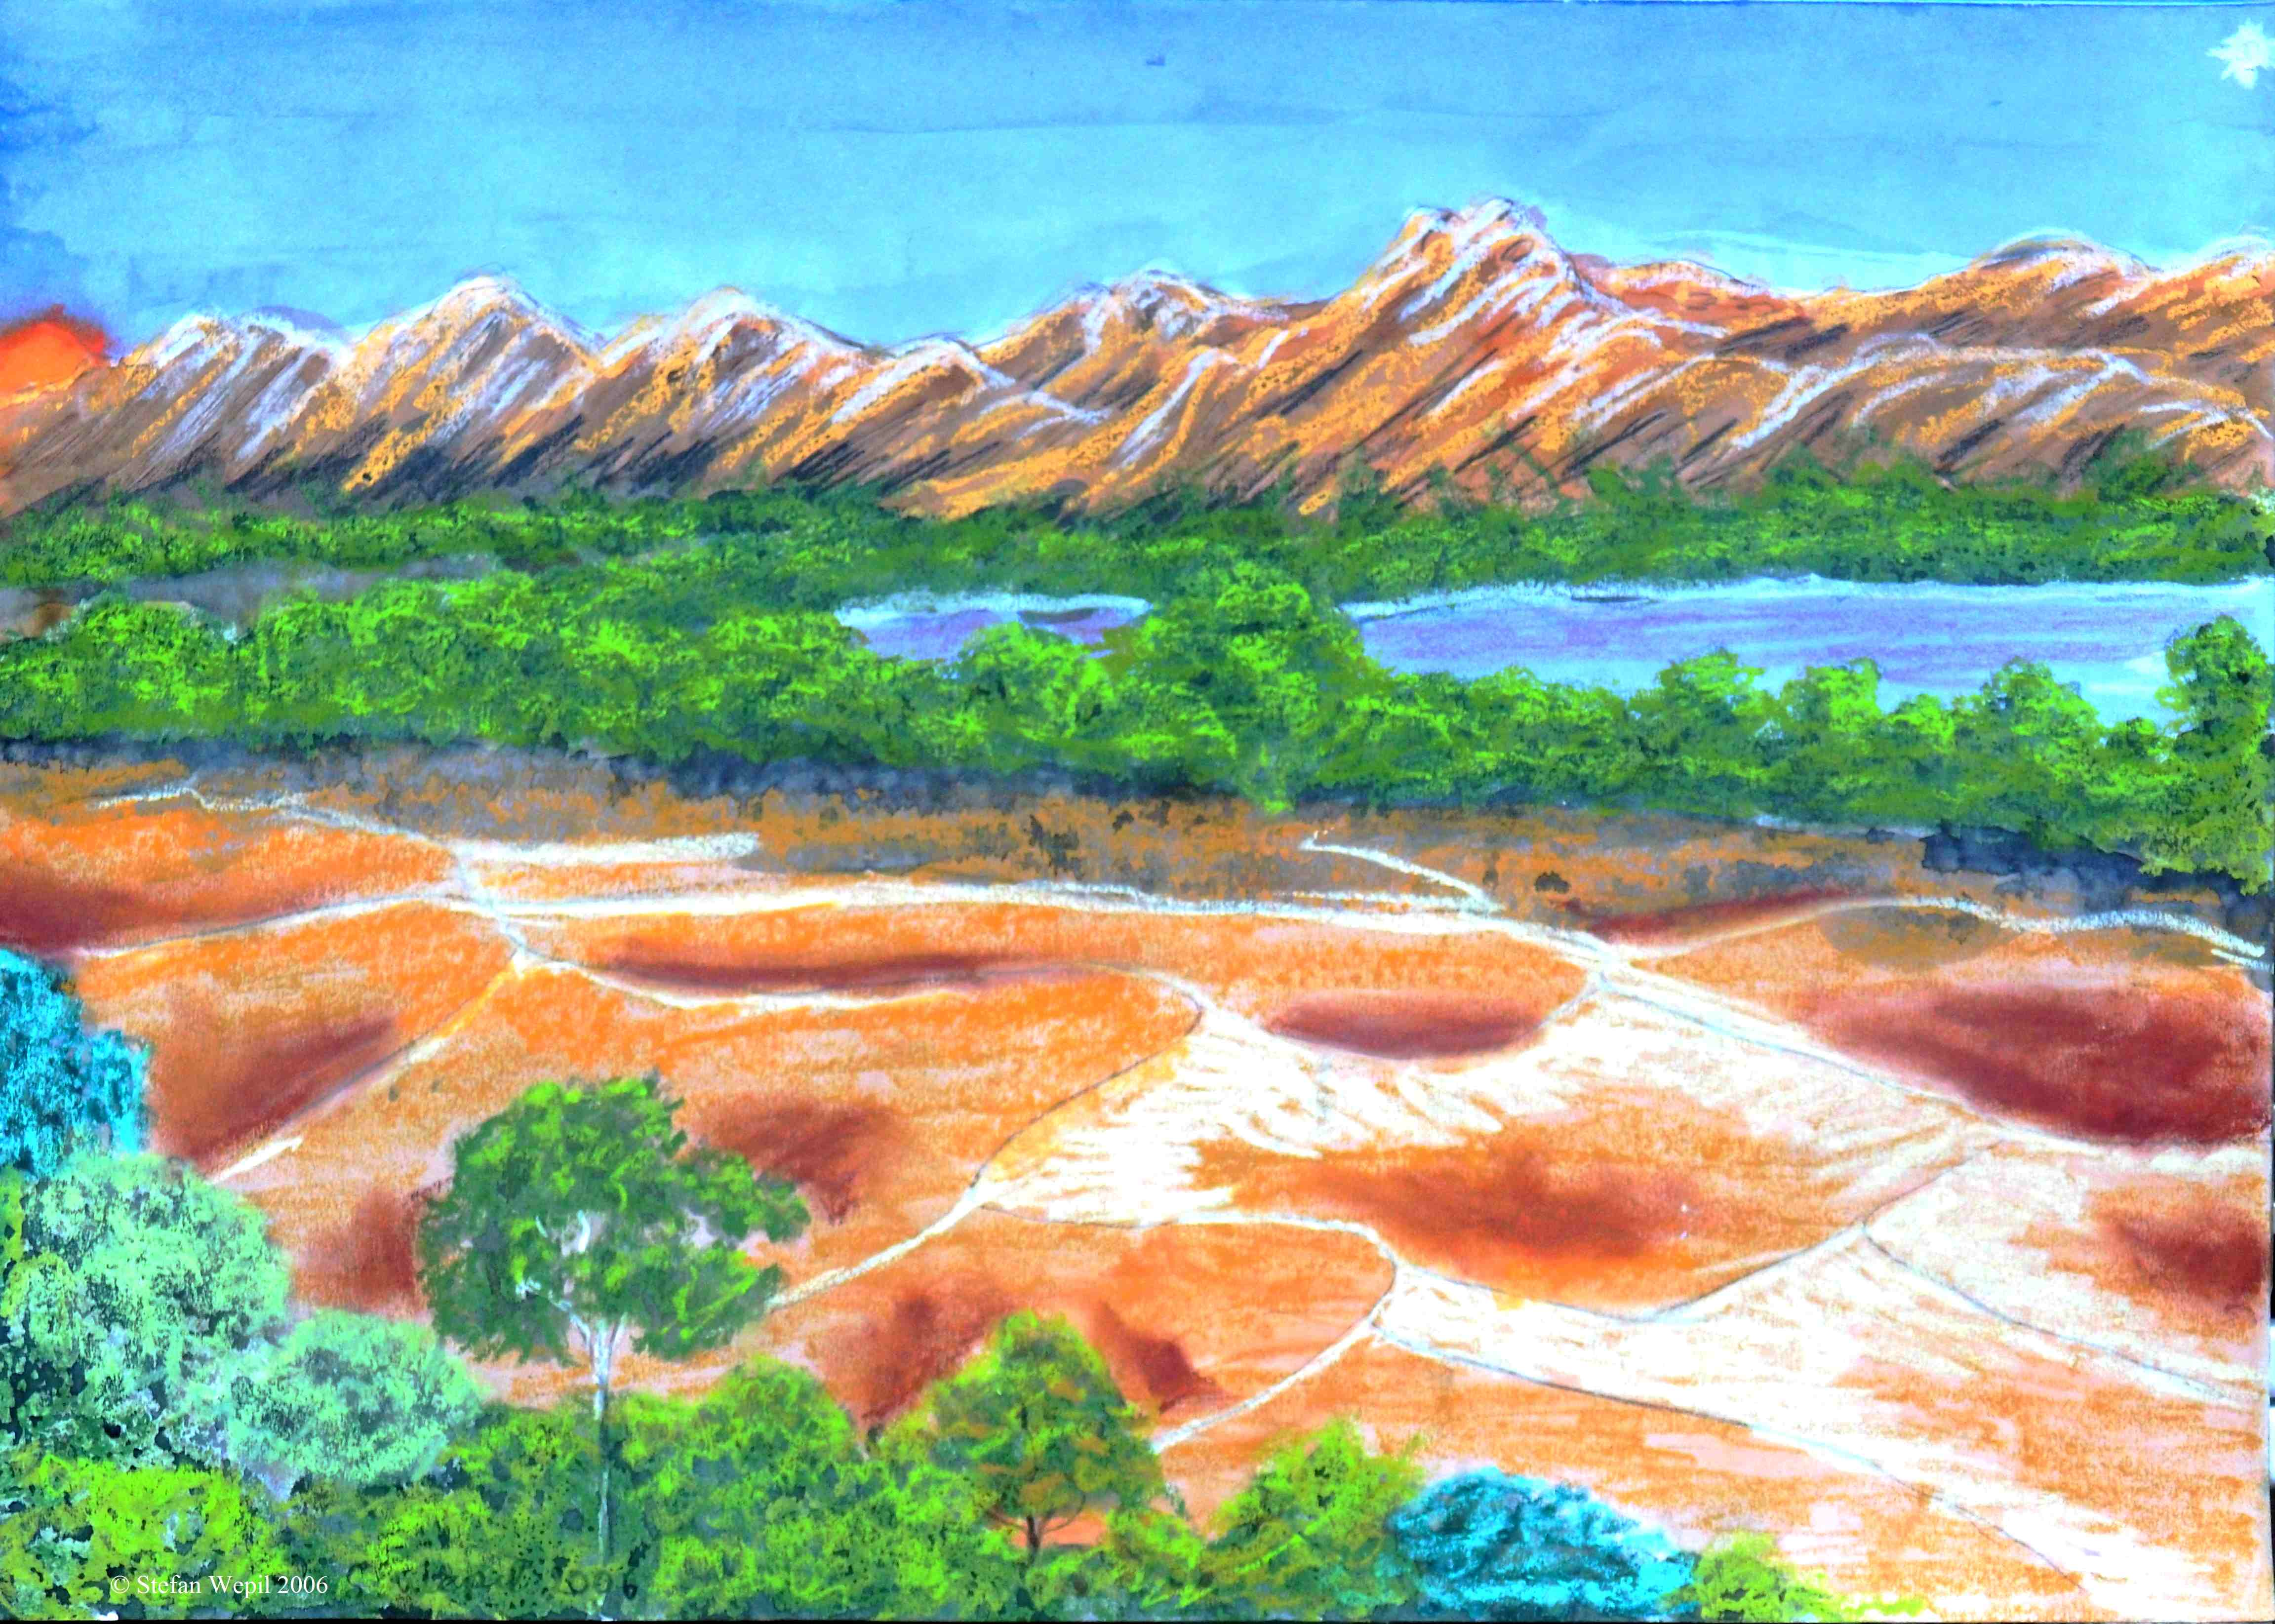 Flussoase von Xamour (C) Stefan Wepil